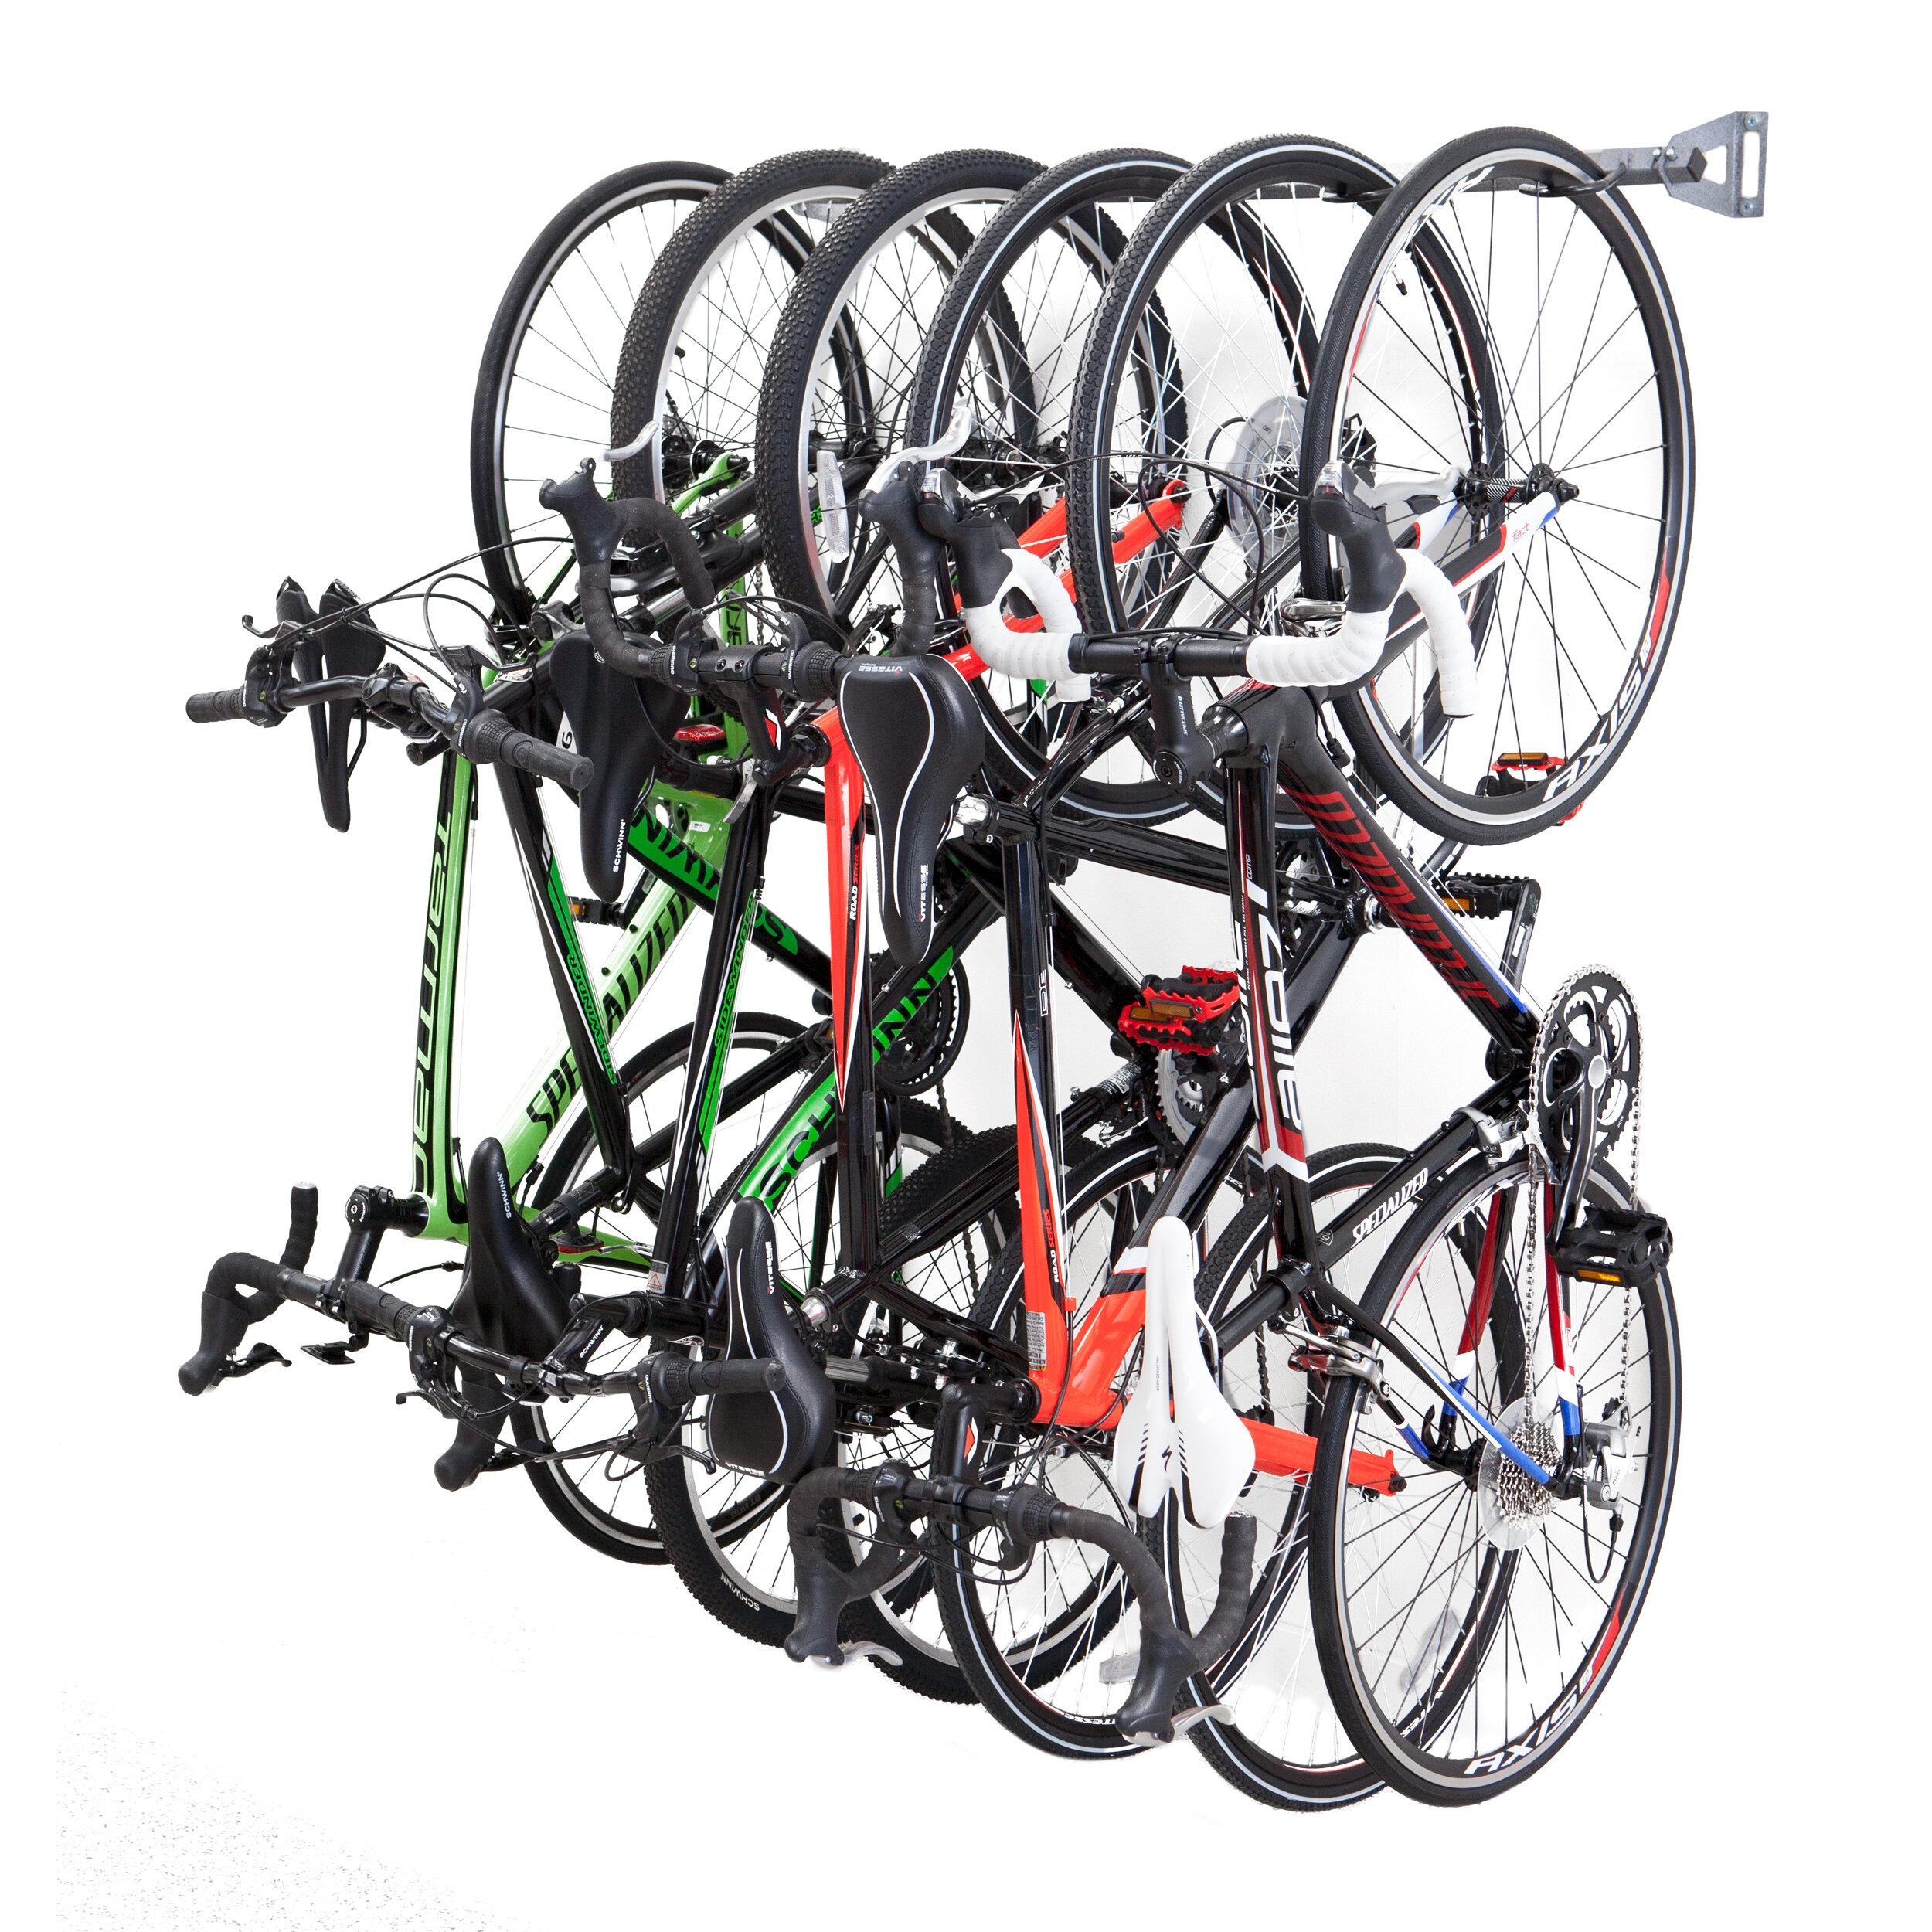 tern folding singapore bike gear it s tn bikes mount bicycle perch wall sg rack